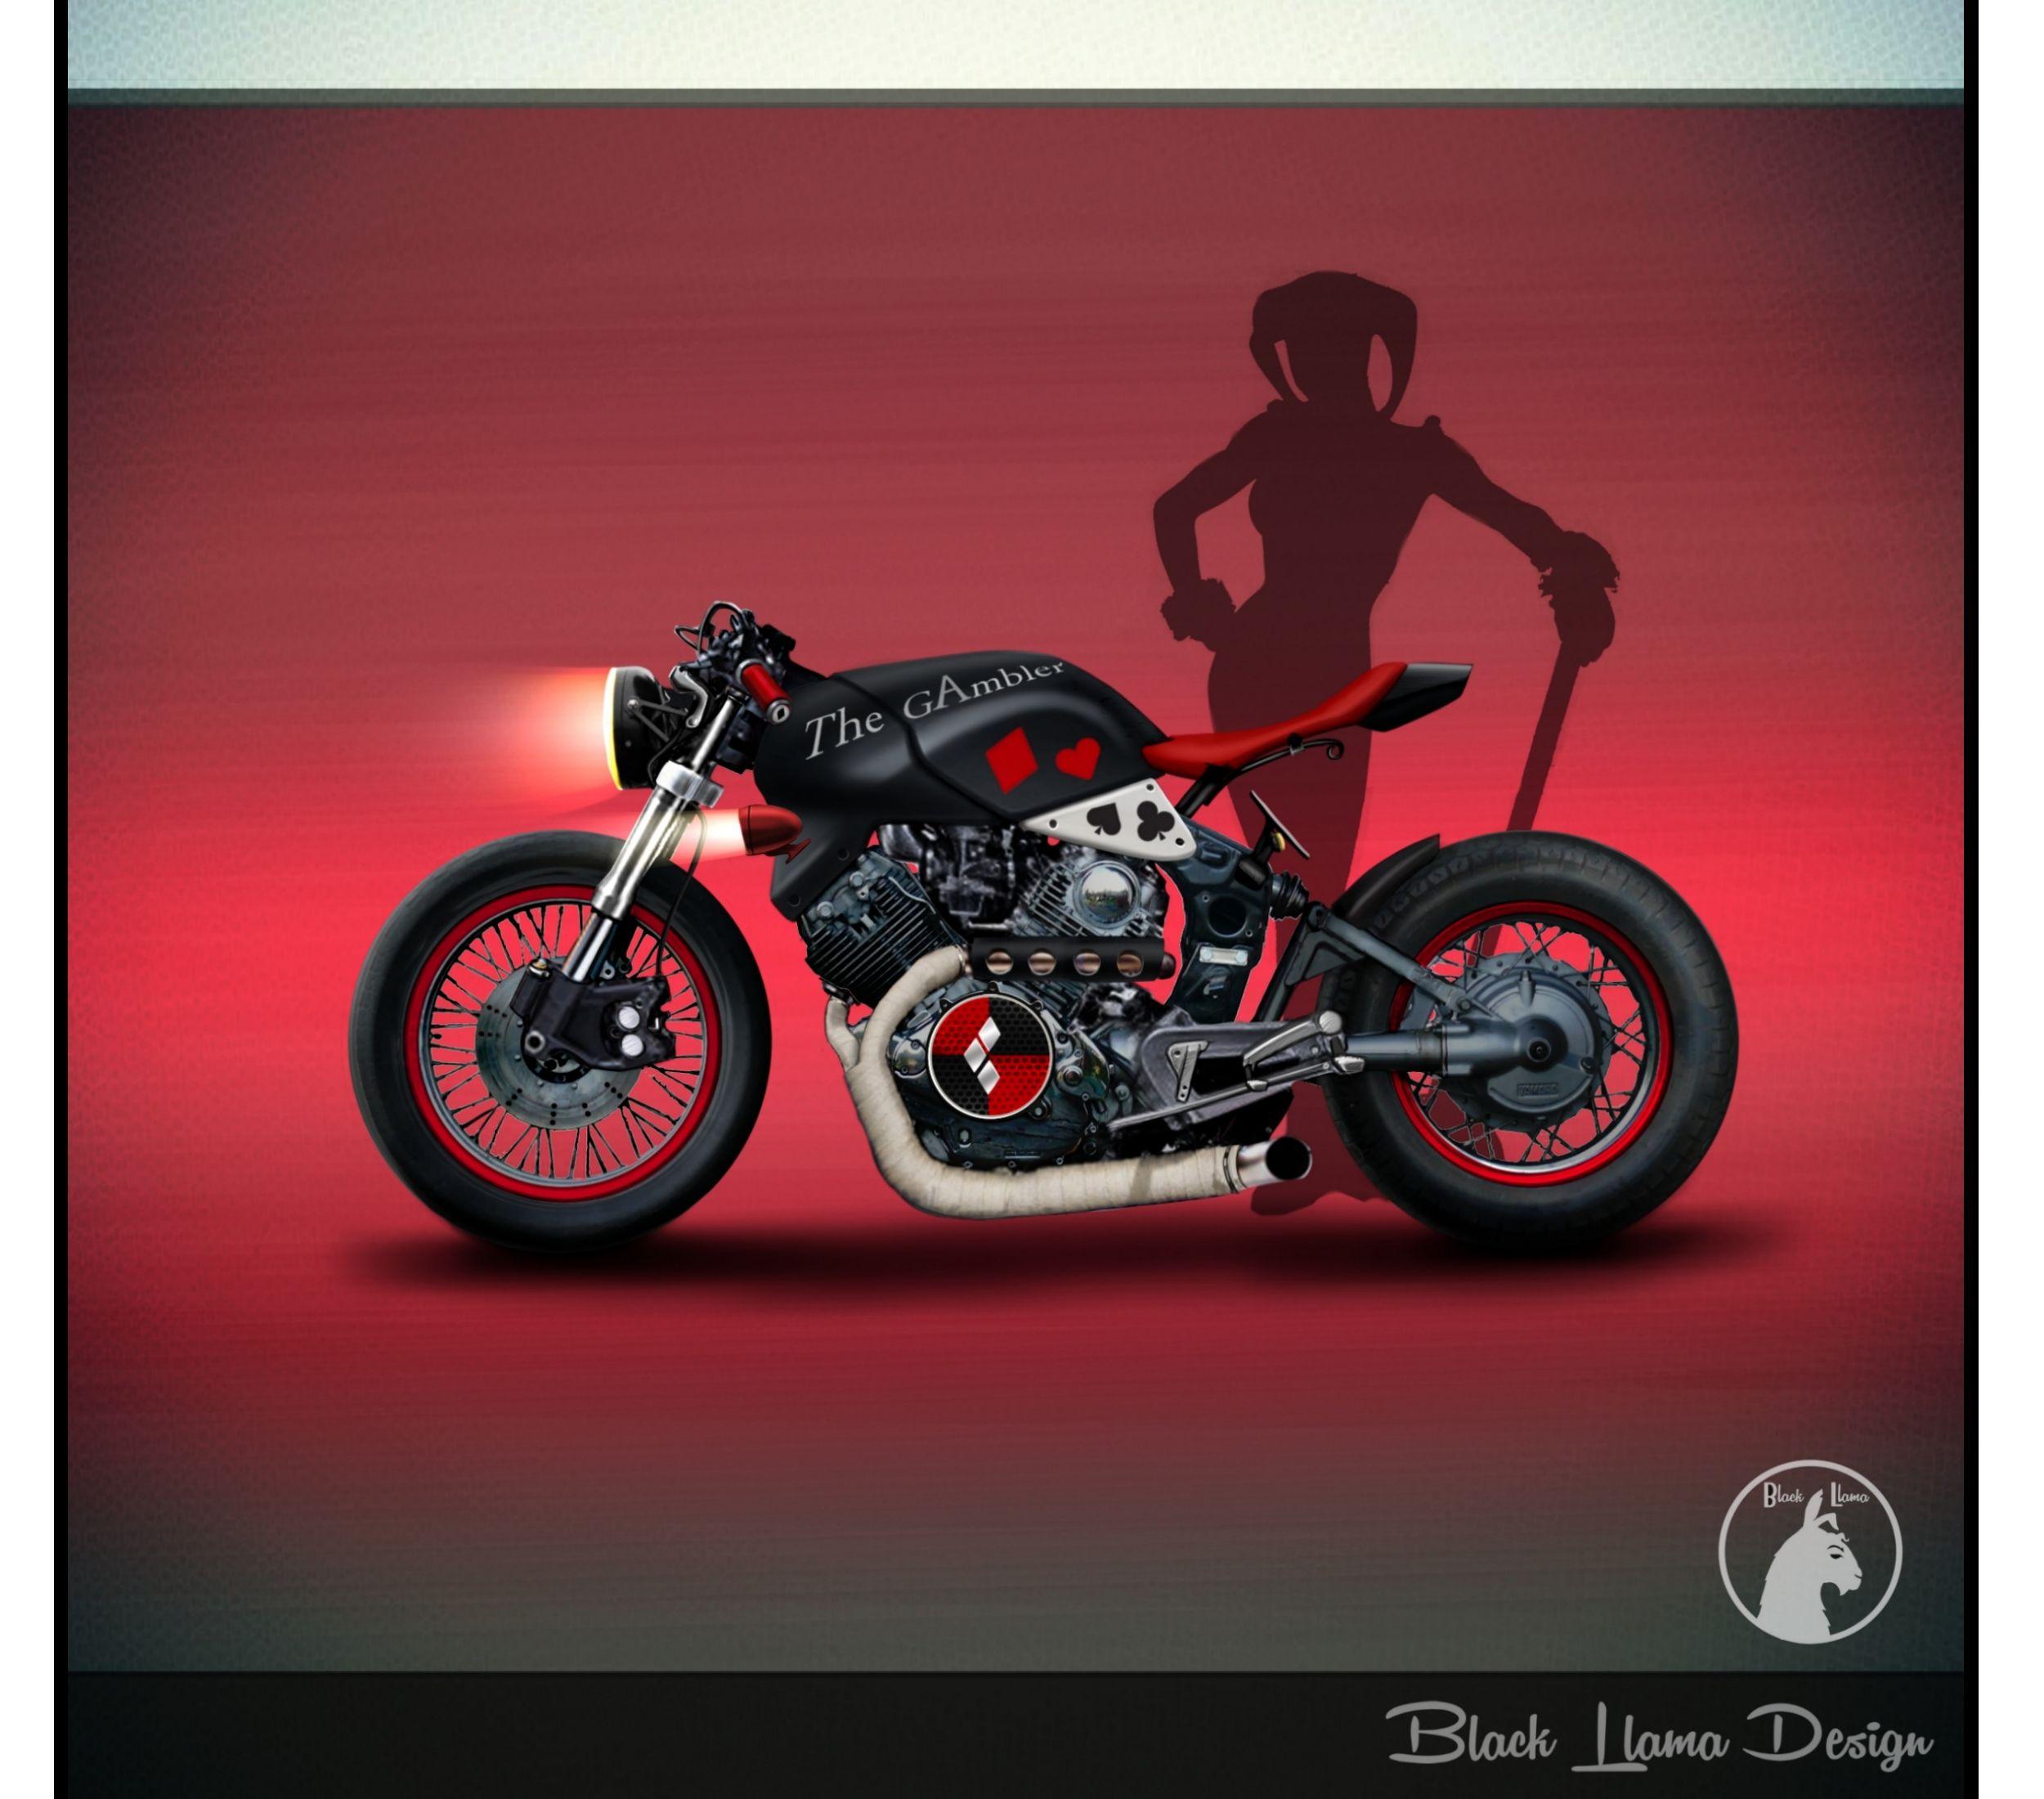 Harley Quinn Motorcycle (yamaha Virago) Black Llama Design